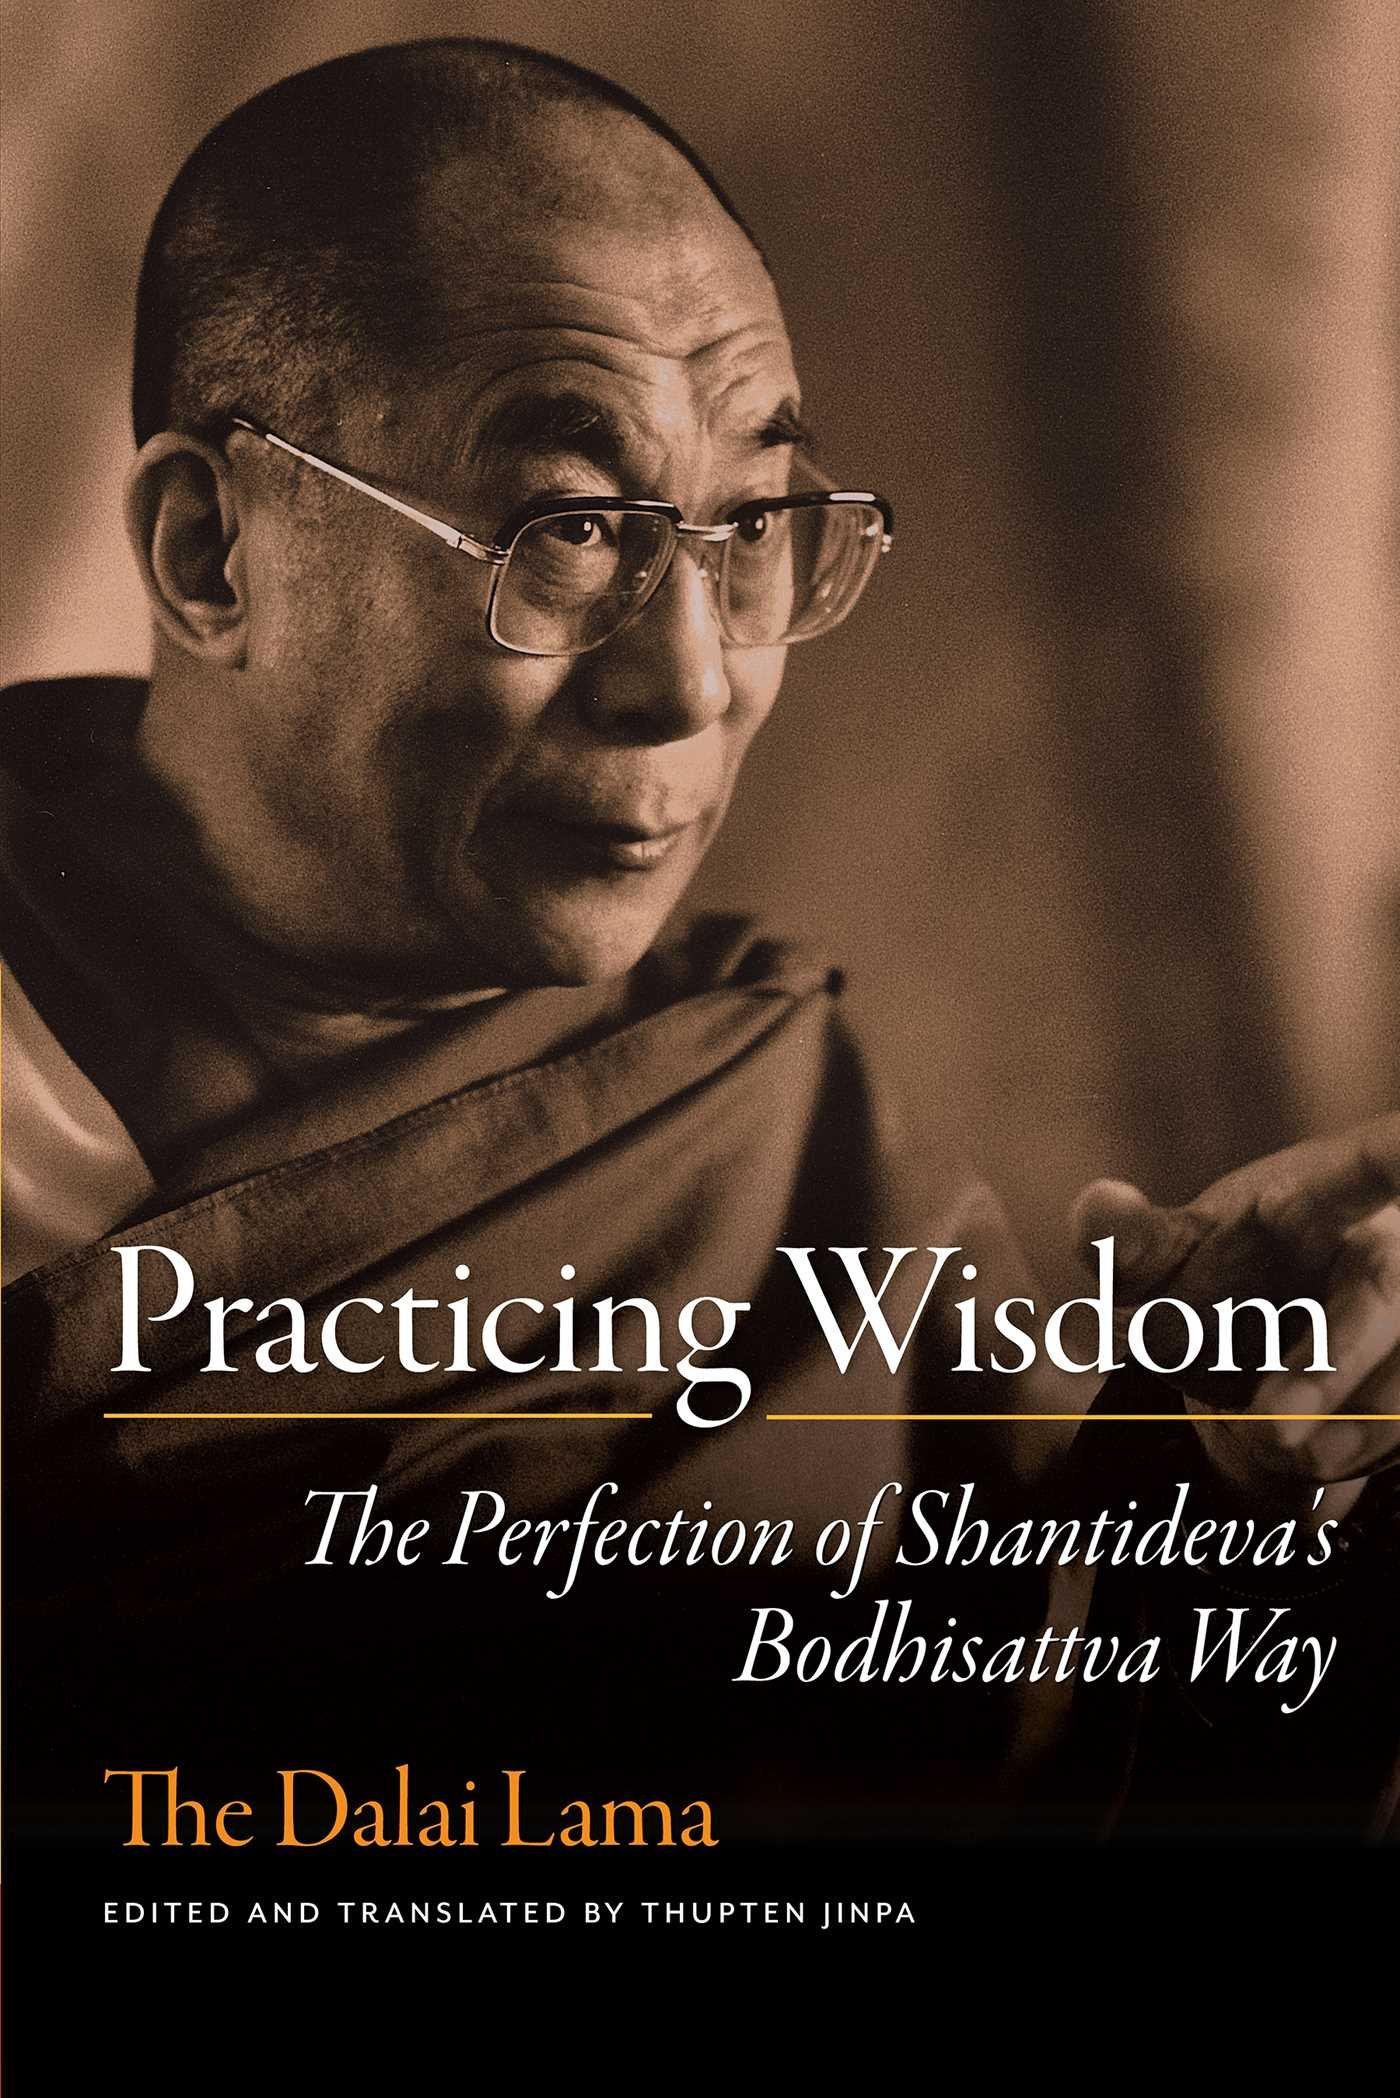 Practicing Wisdom: The Perfection of Shantideva's Bodhisattva Way